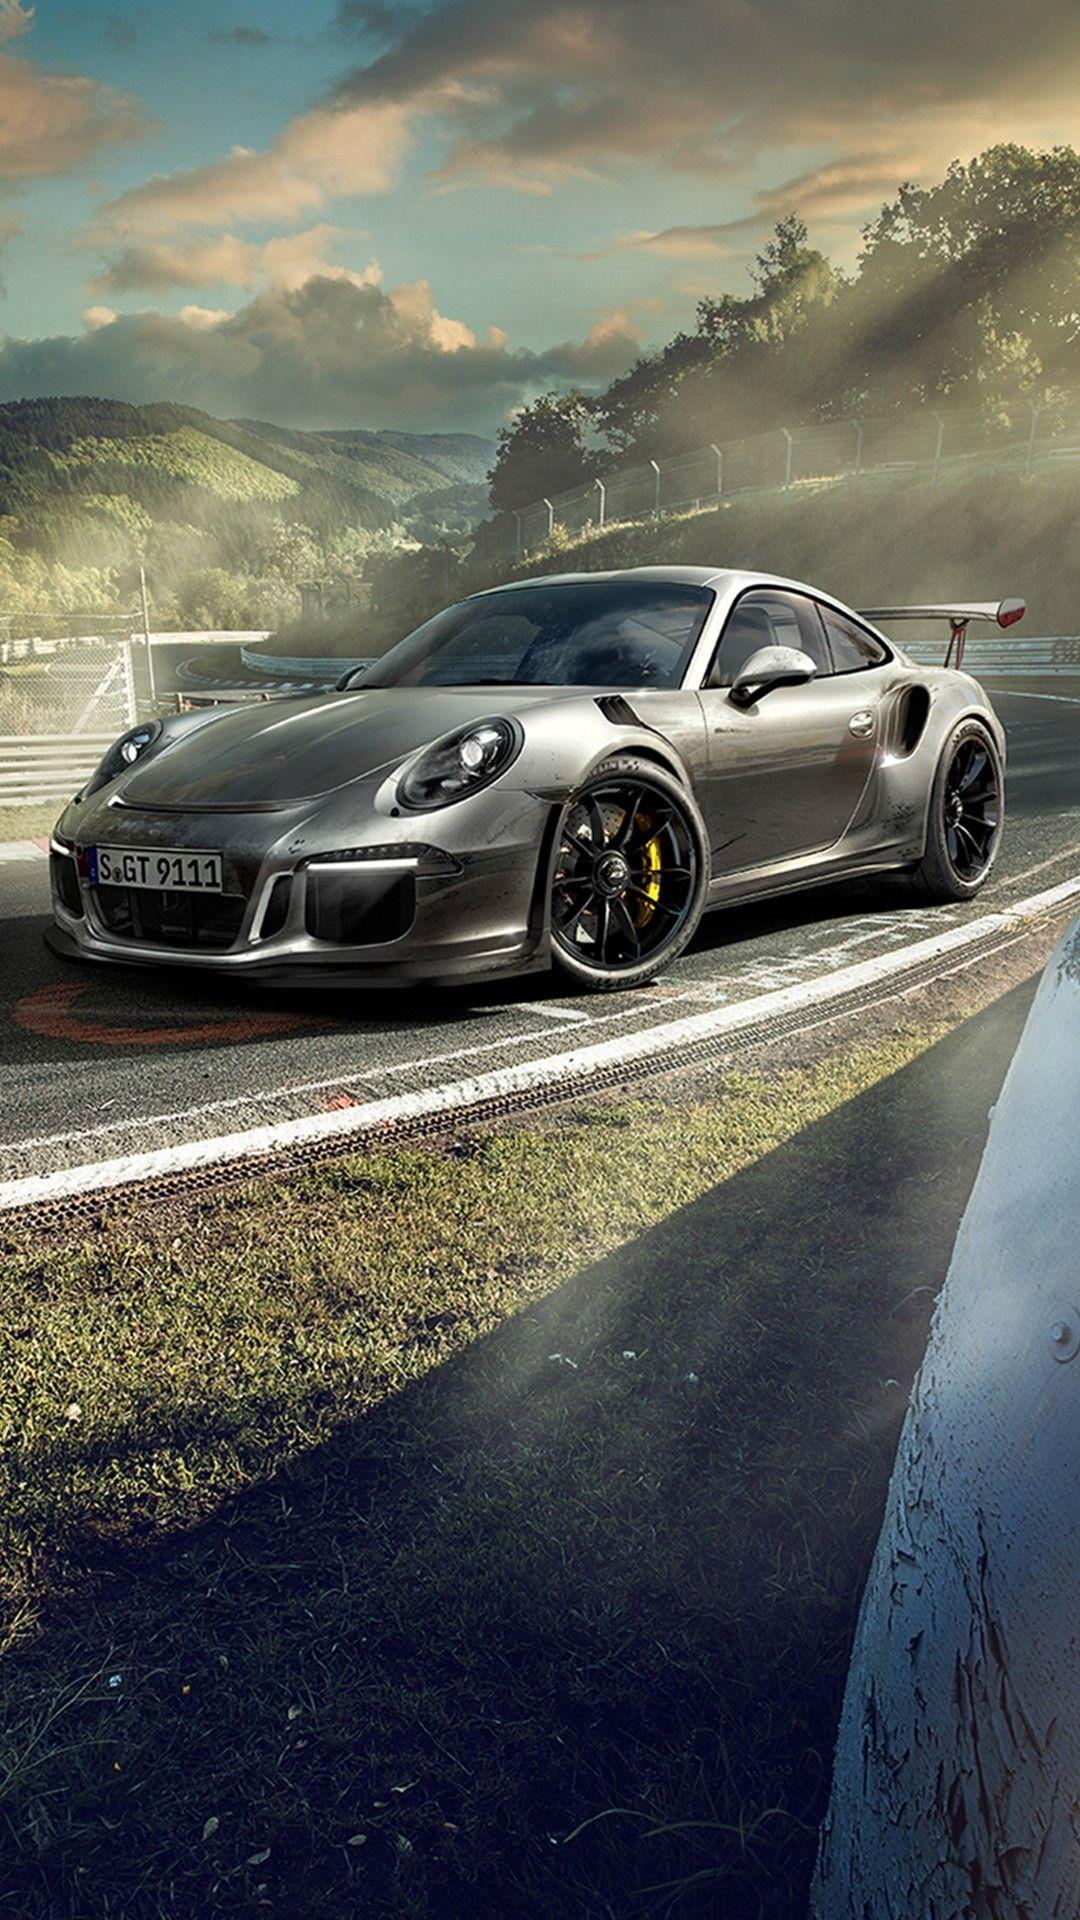 Porshe Super Luxury Cars Porsche Porsche Sports Car